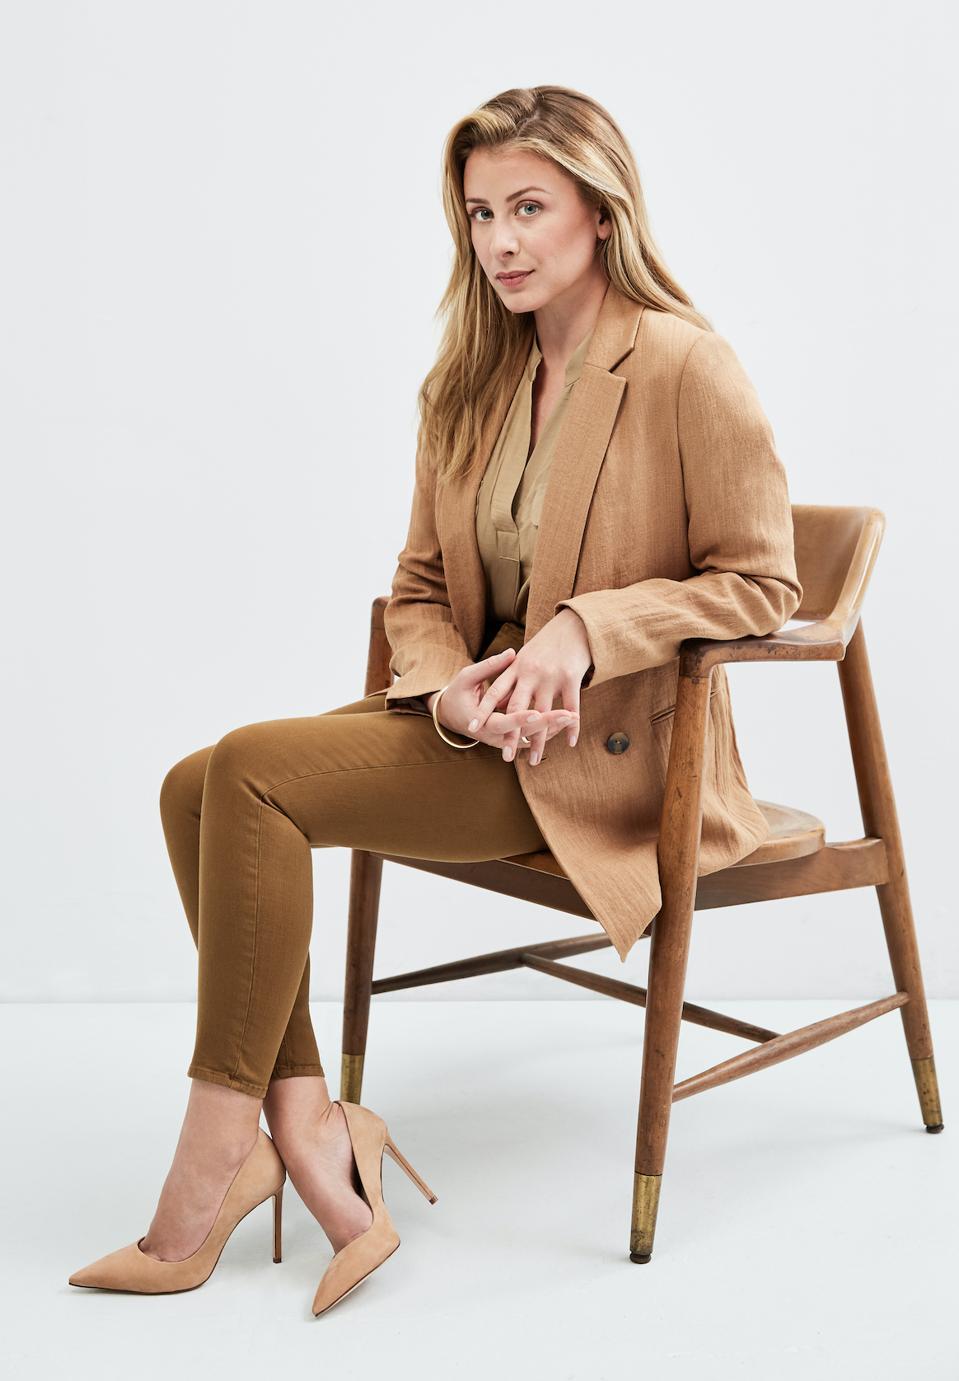 Founder Lauren Bosworth